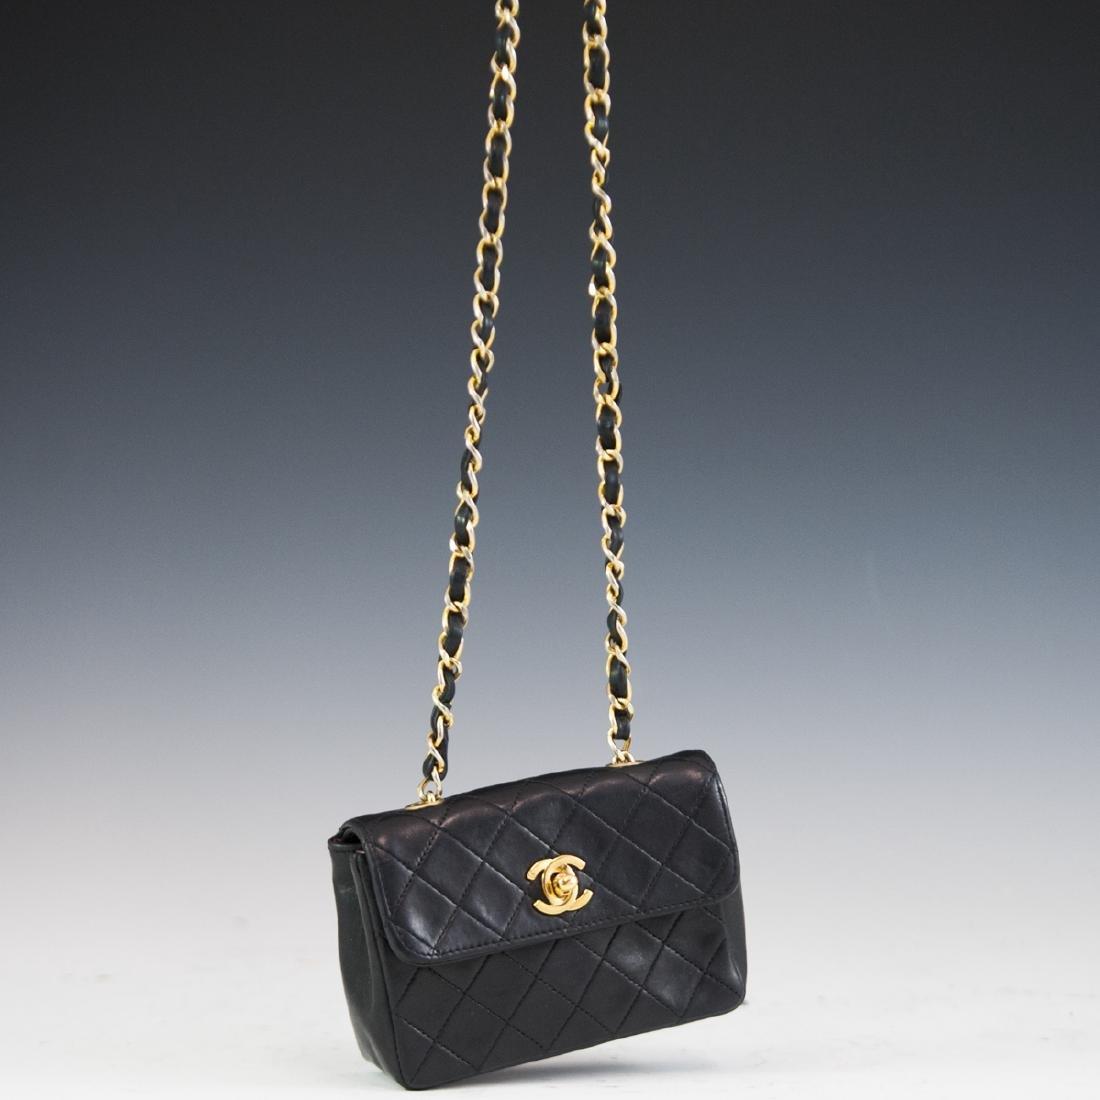 Chanel Mini Black Leather Flap Bag